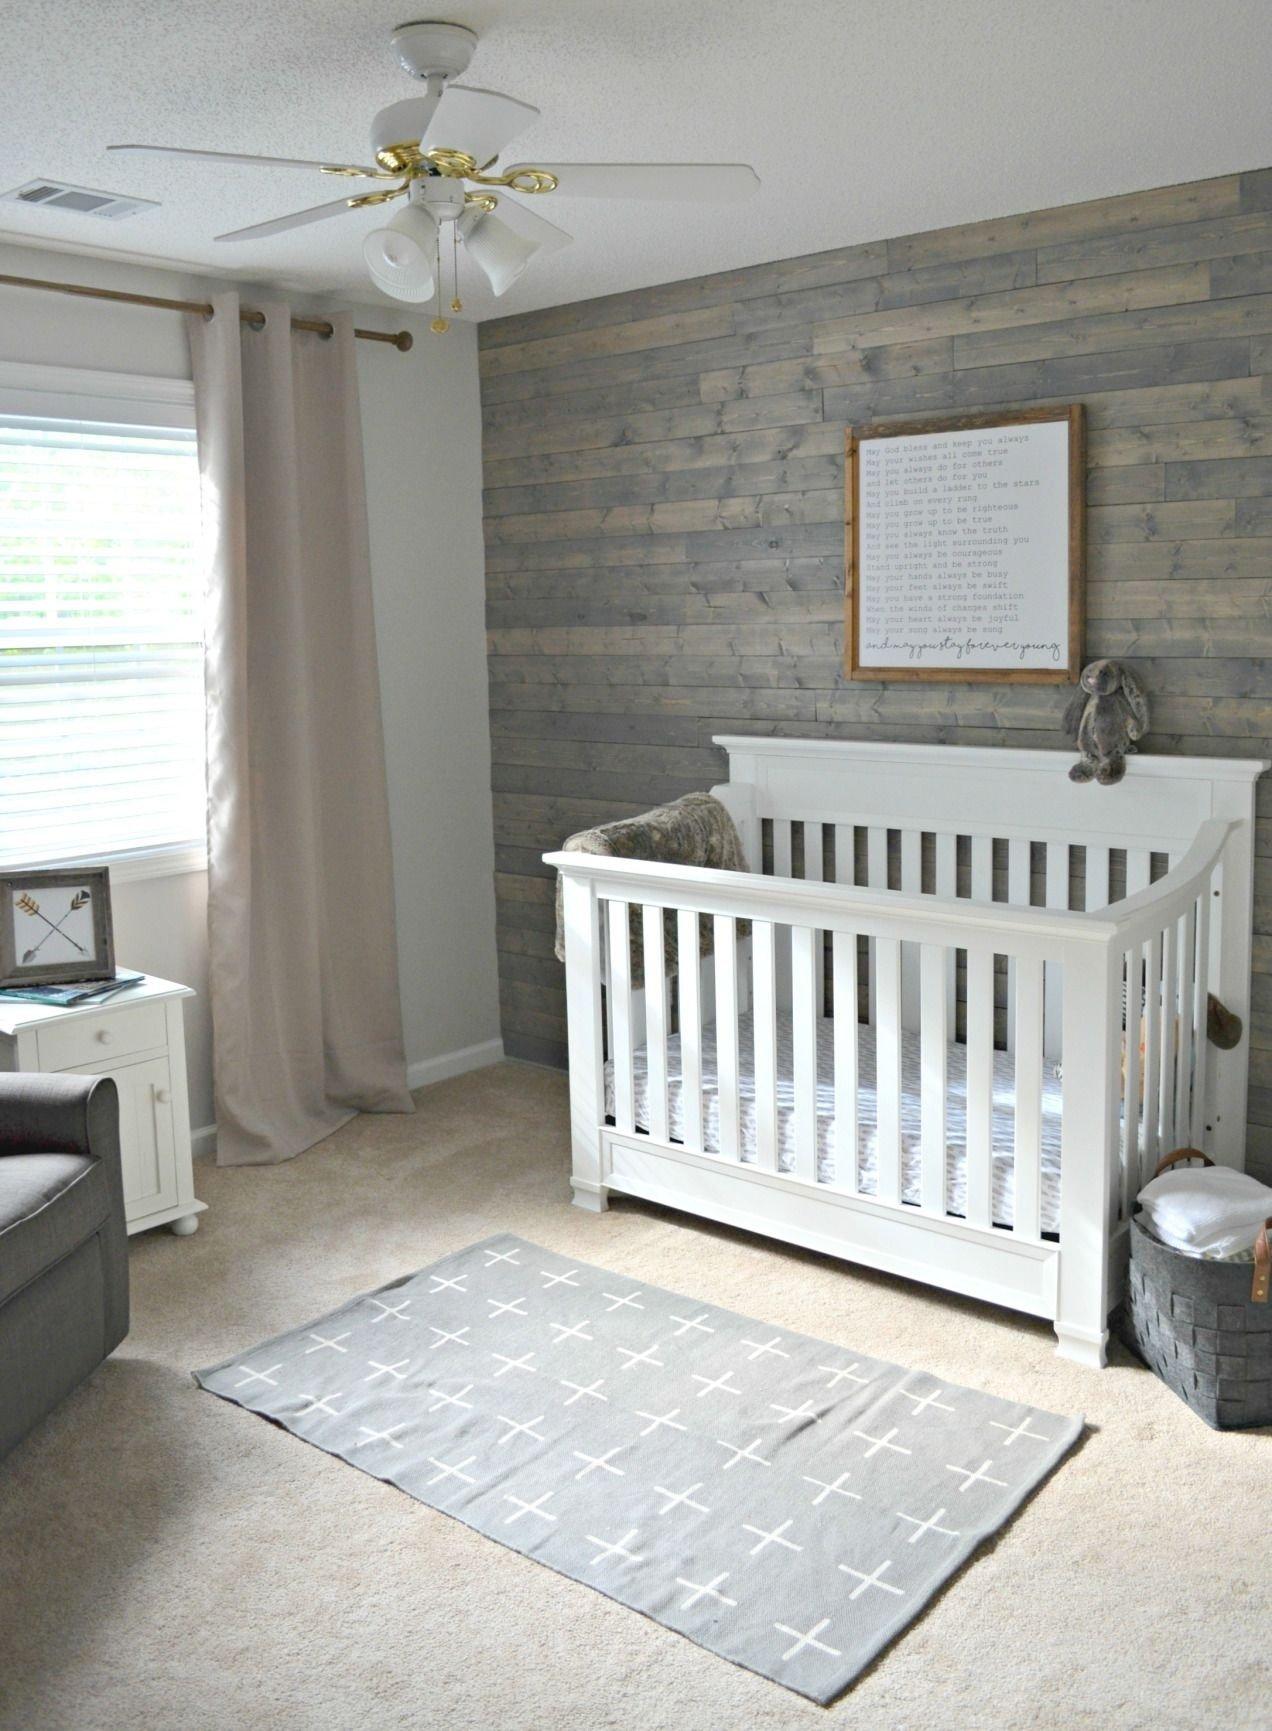 10 Lovely Baby Boy Nursery Ideas Pinterest rustic boy nursery woodsy outdoor themed nursery woodland nursery 2021